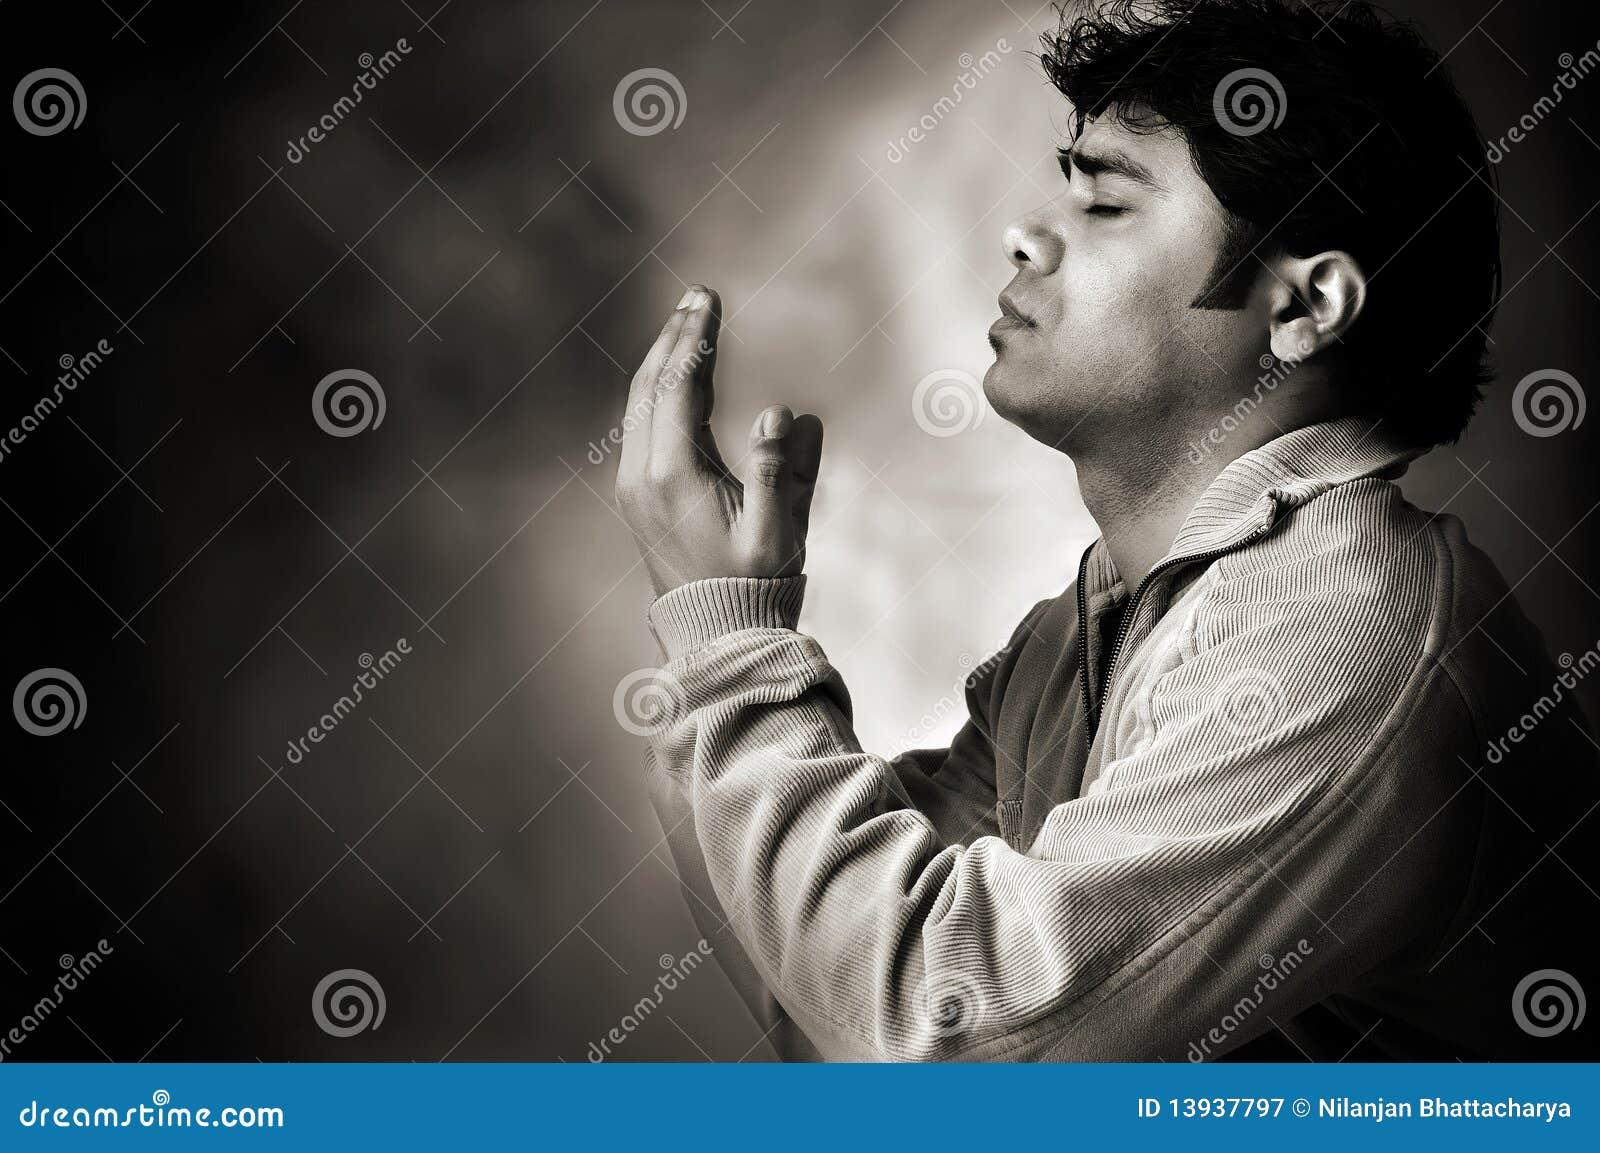 Saying a prayer to god